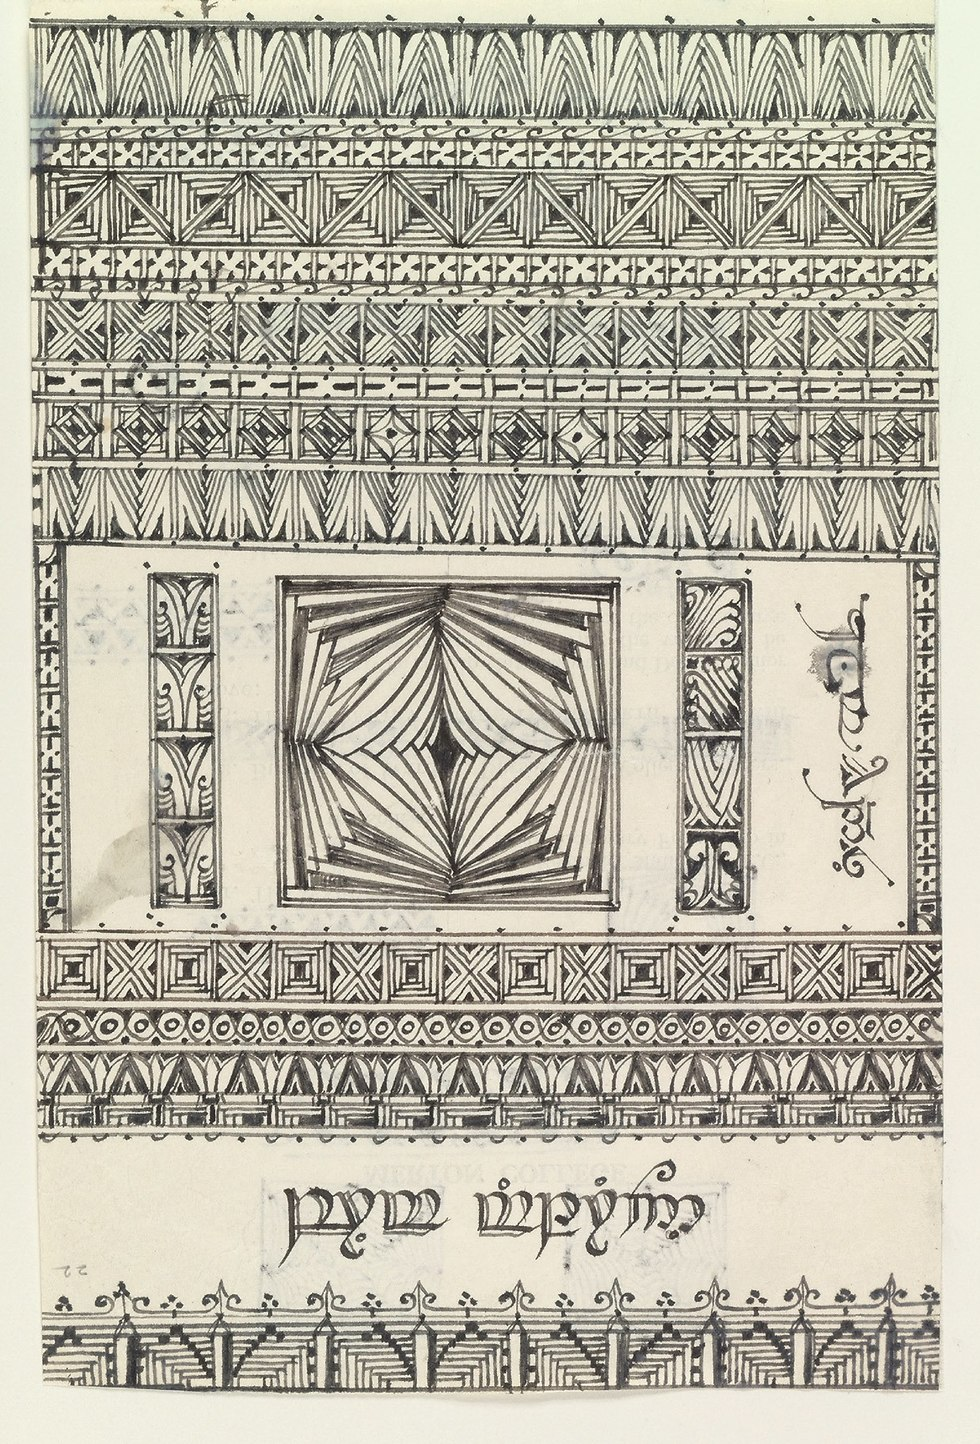 Parma Mittarion (The Tolkien Trust 2018)